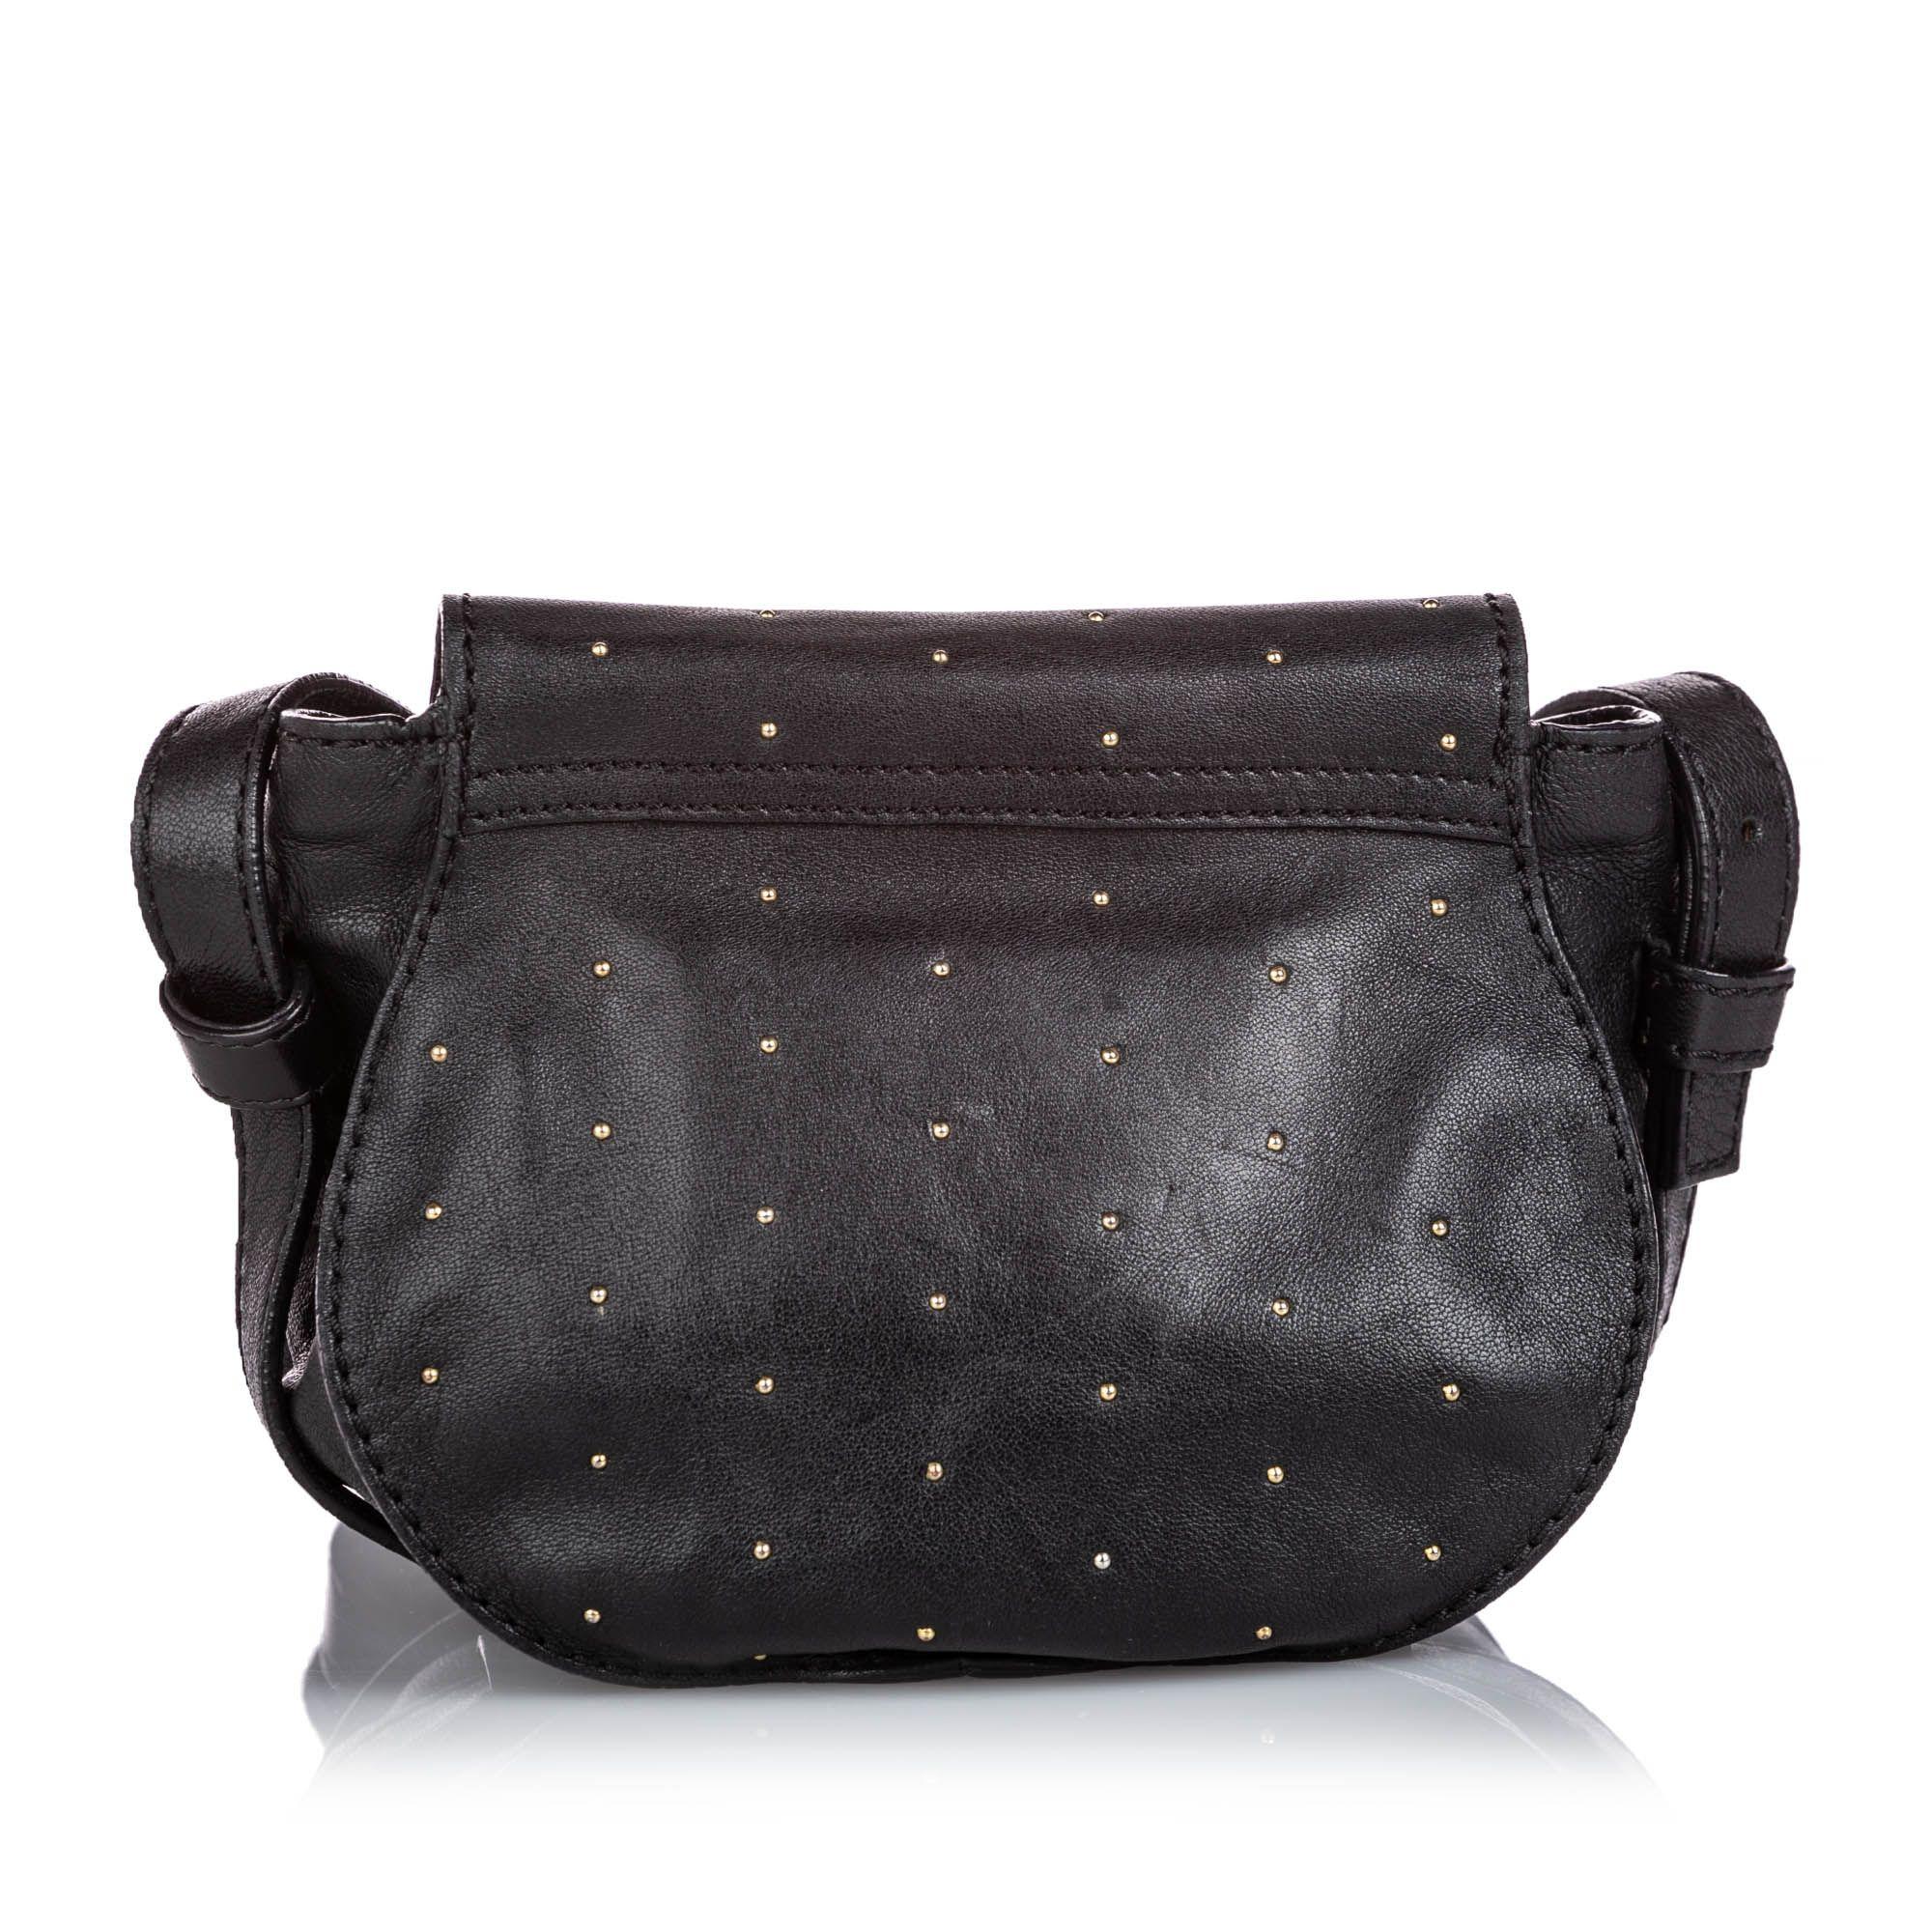 Vintage Chloe Leather Marcie Crossbody Bag Black